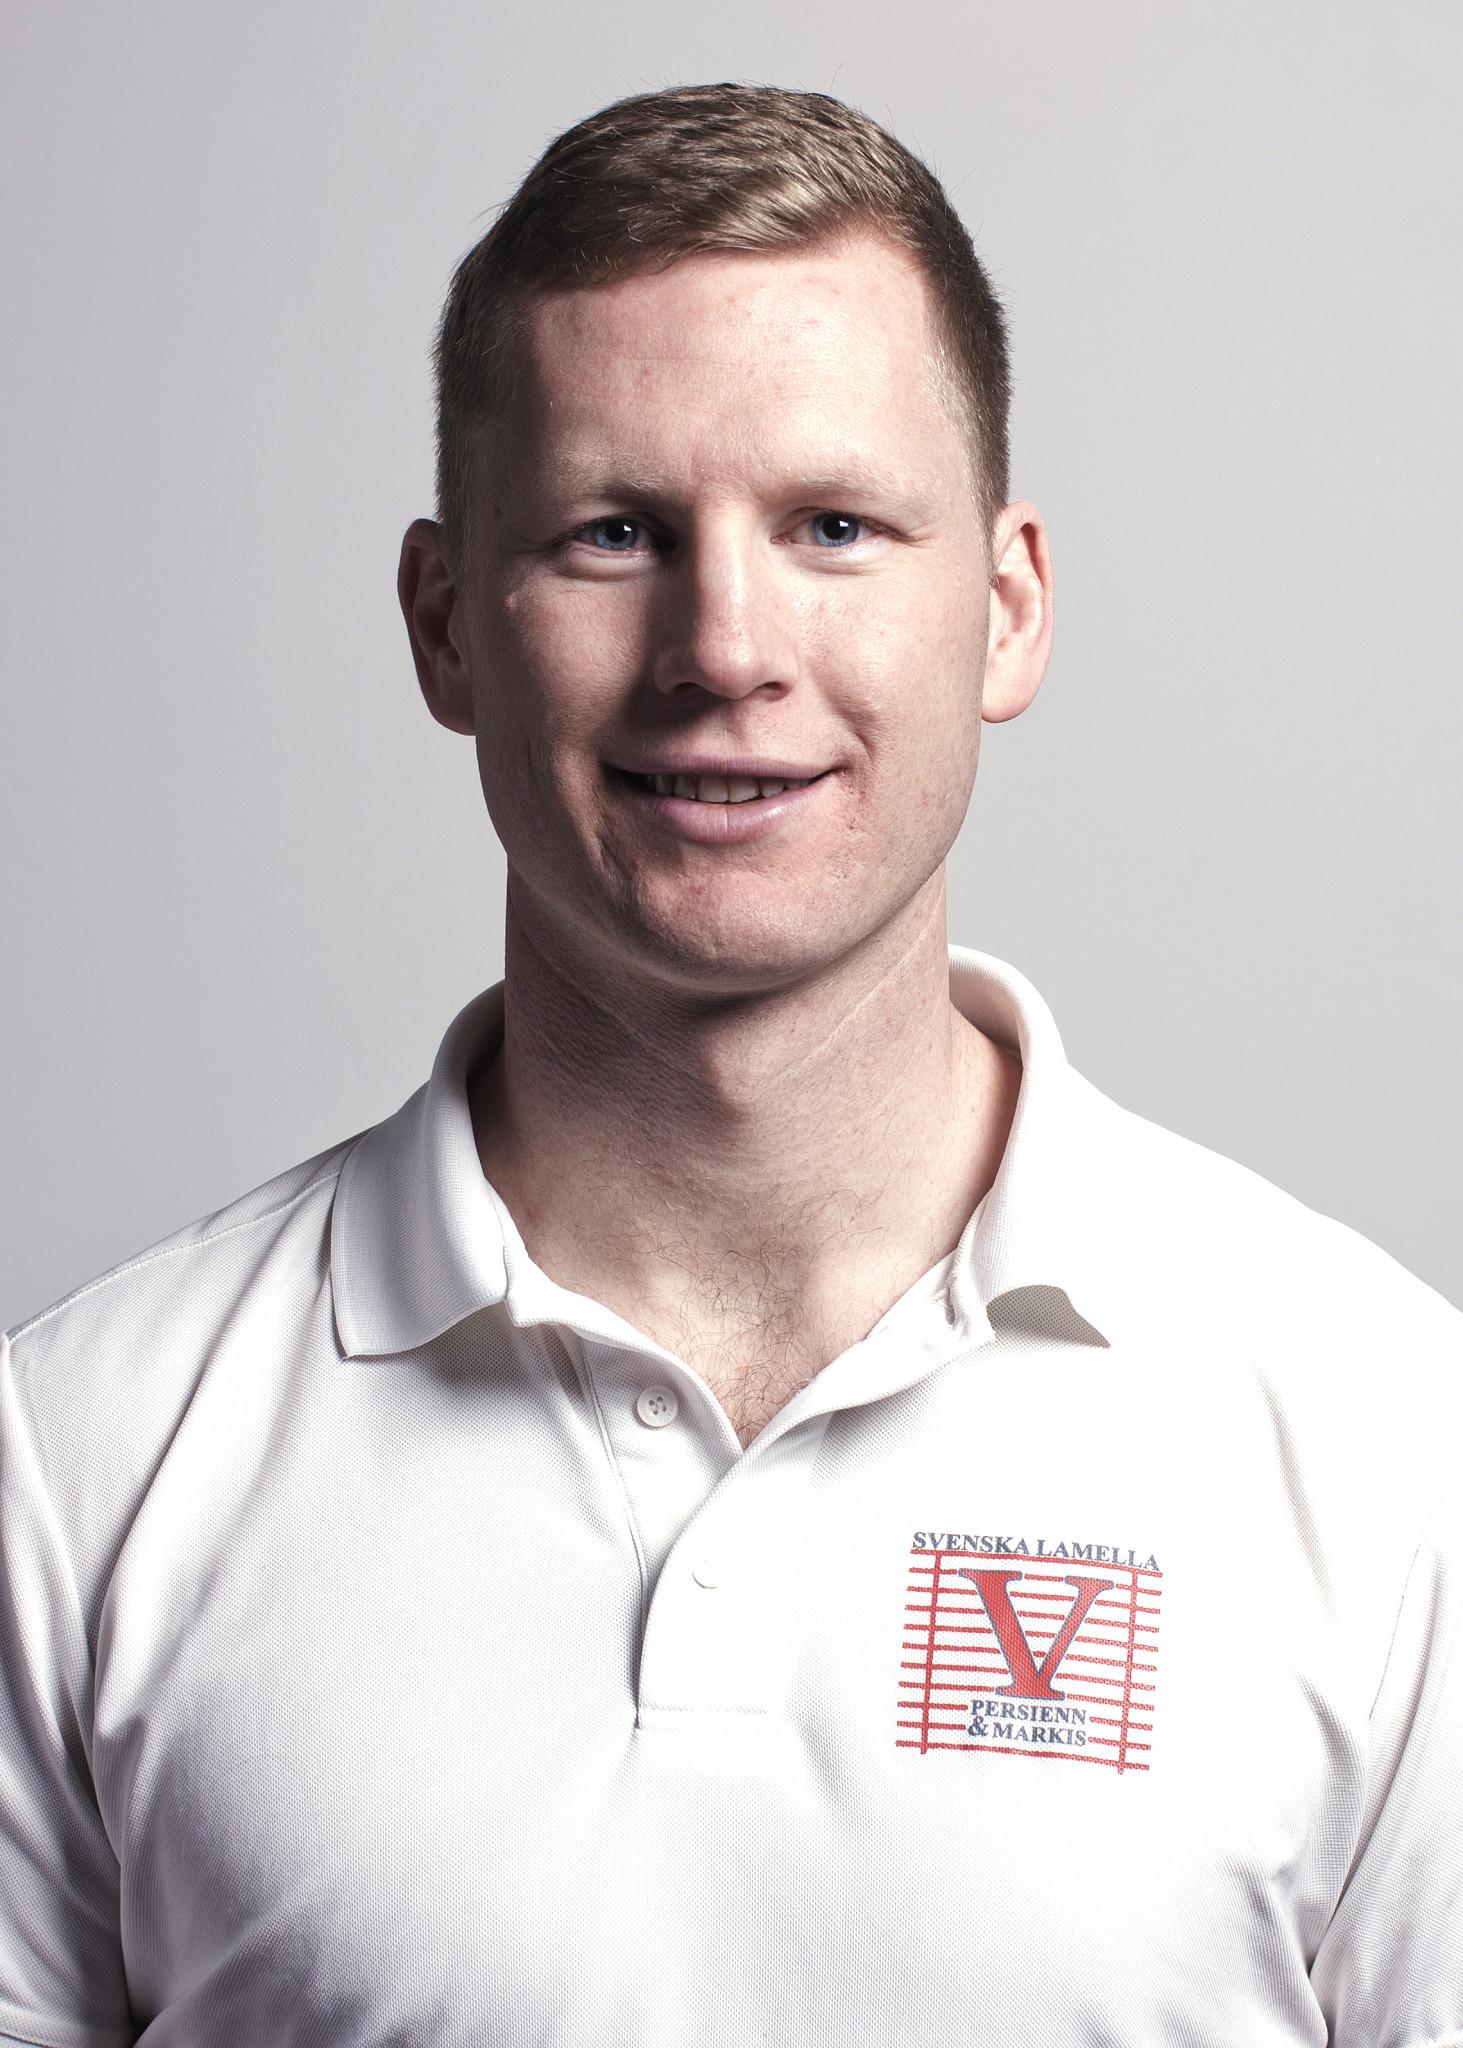 Jim Eriksson